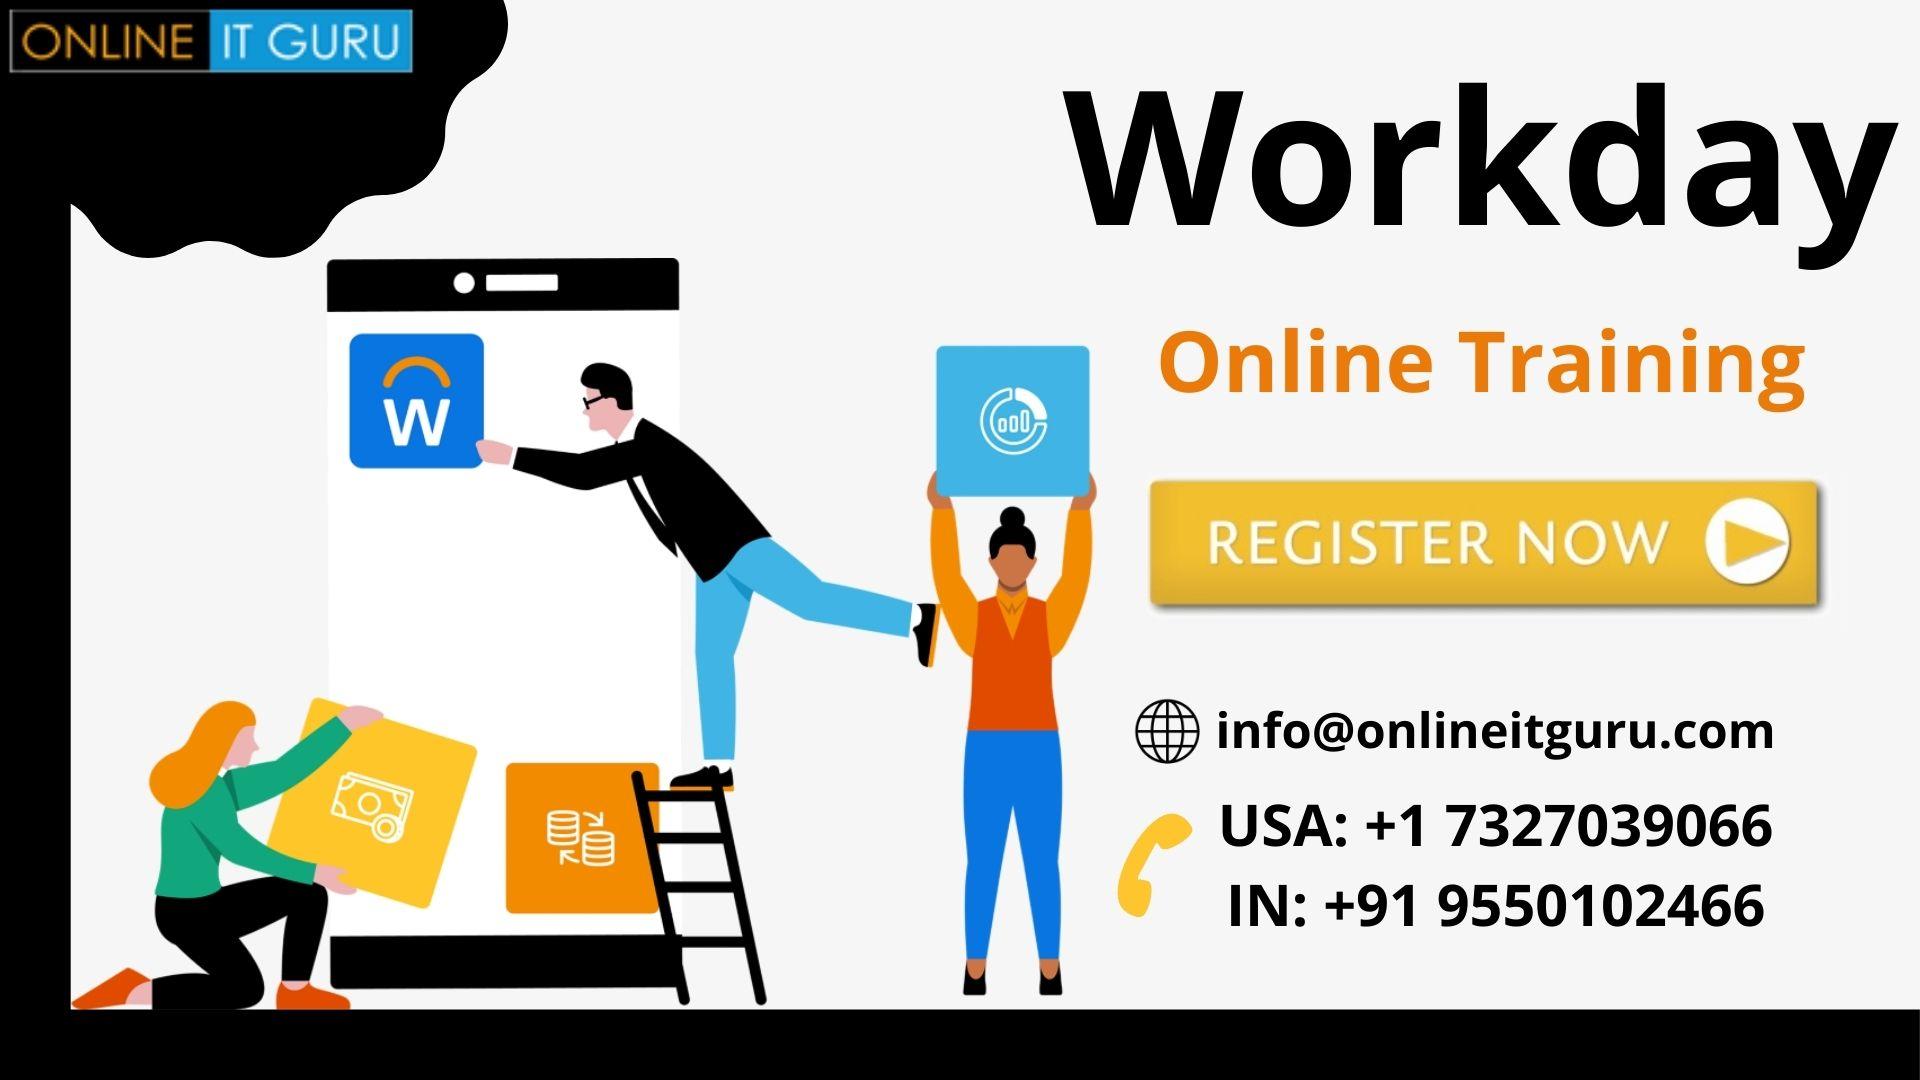 workday online training.jpg